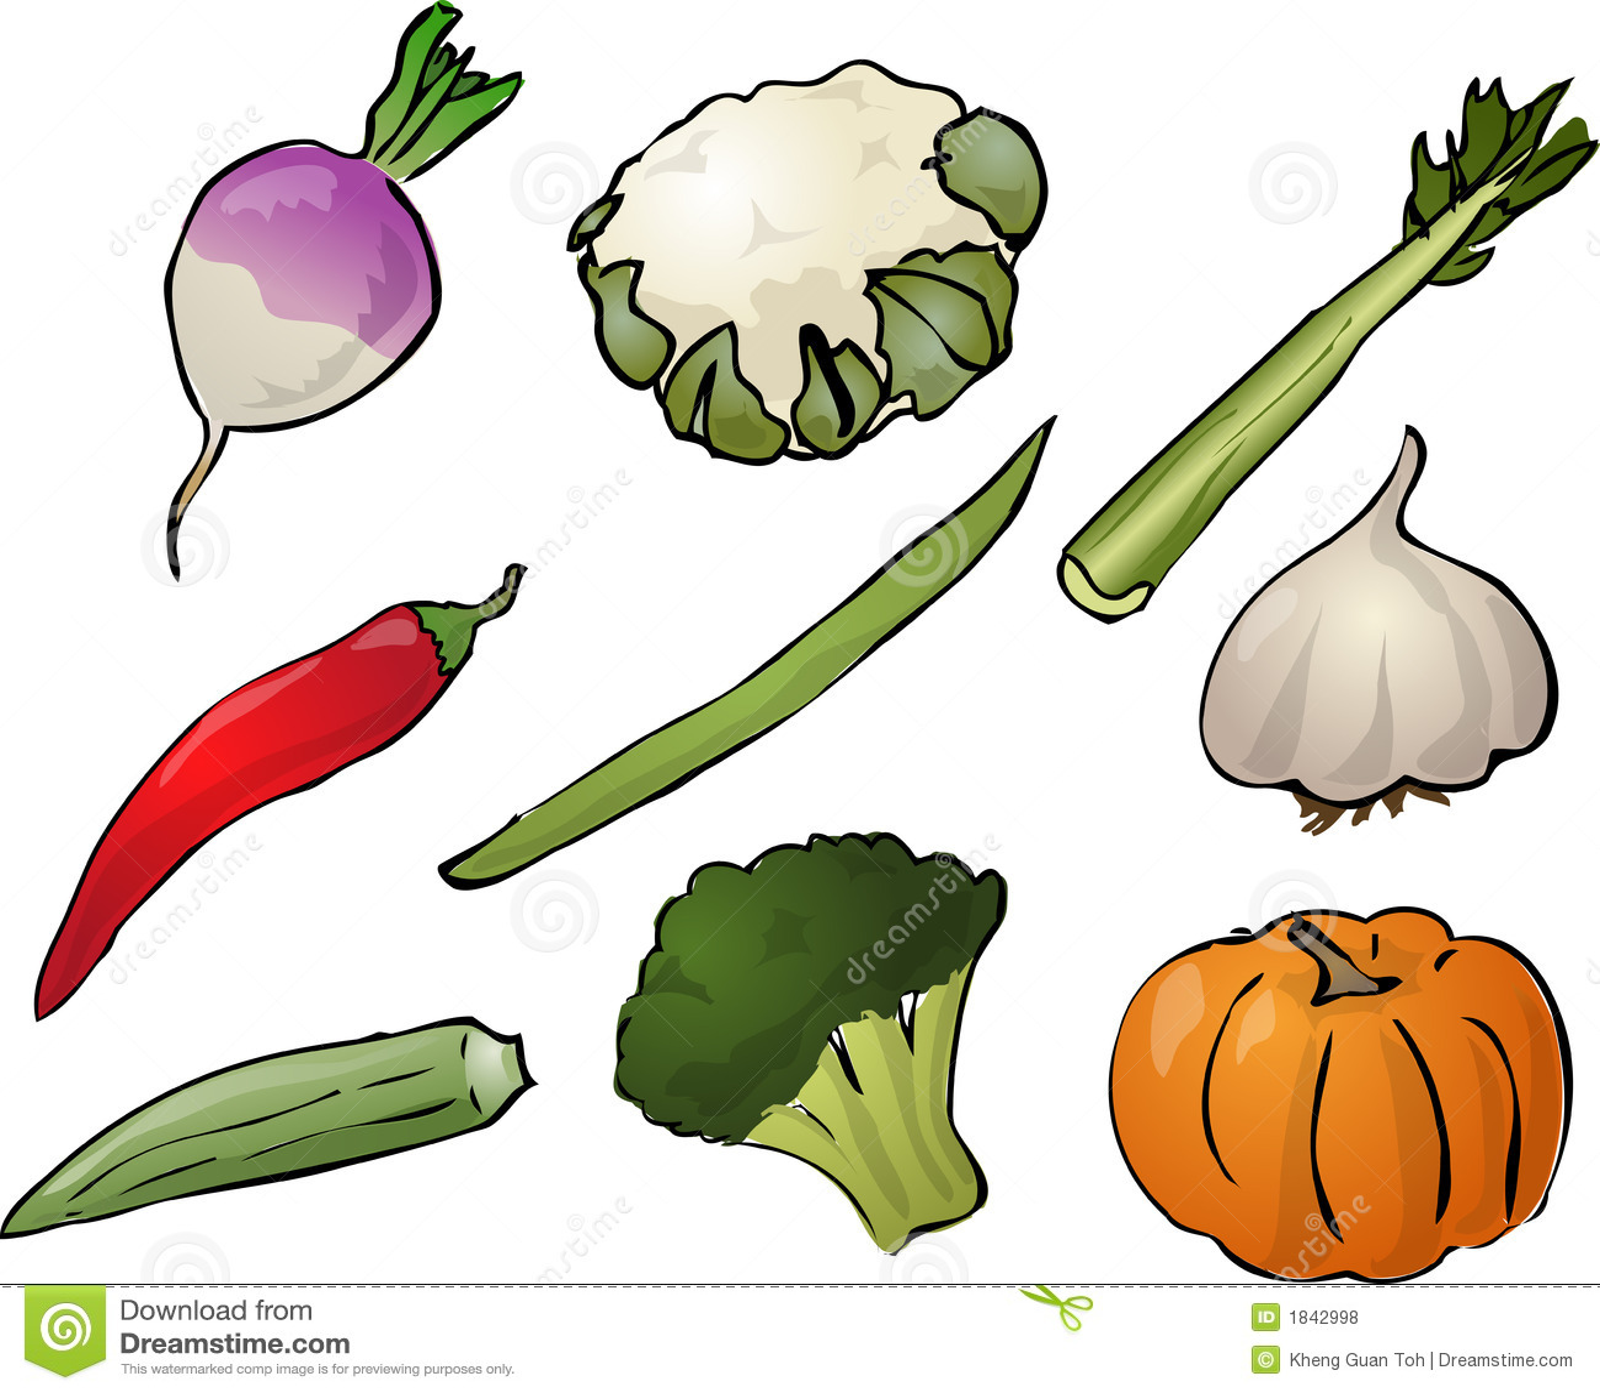 Illustration of vegetables, hand-drawn look: turnip, cauliflower ...